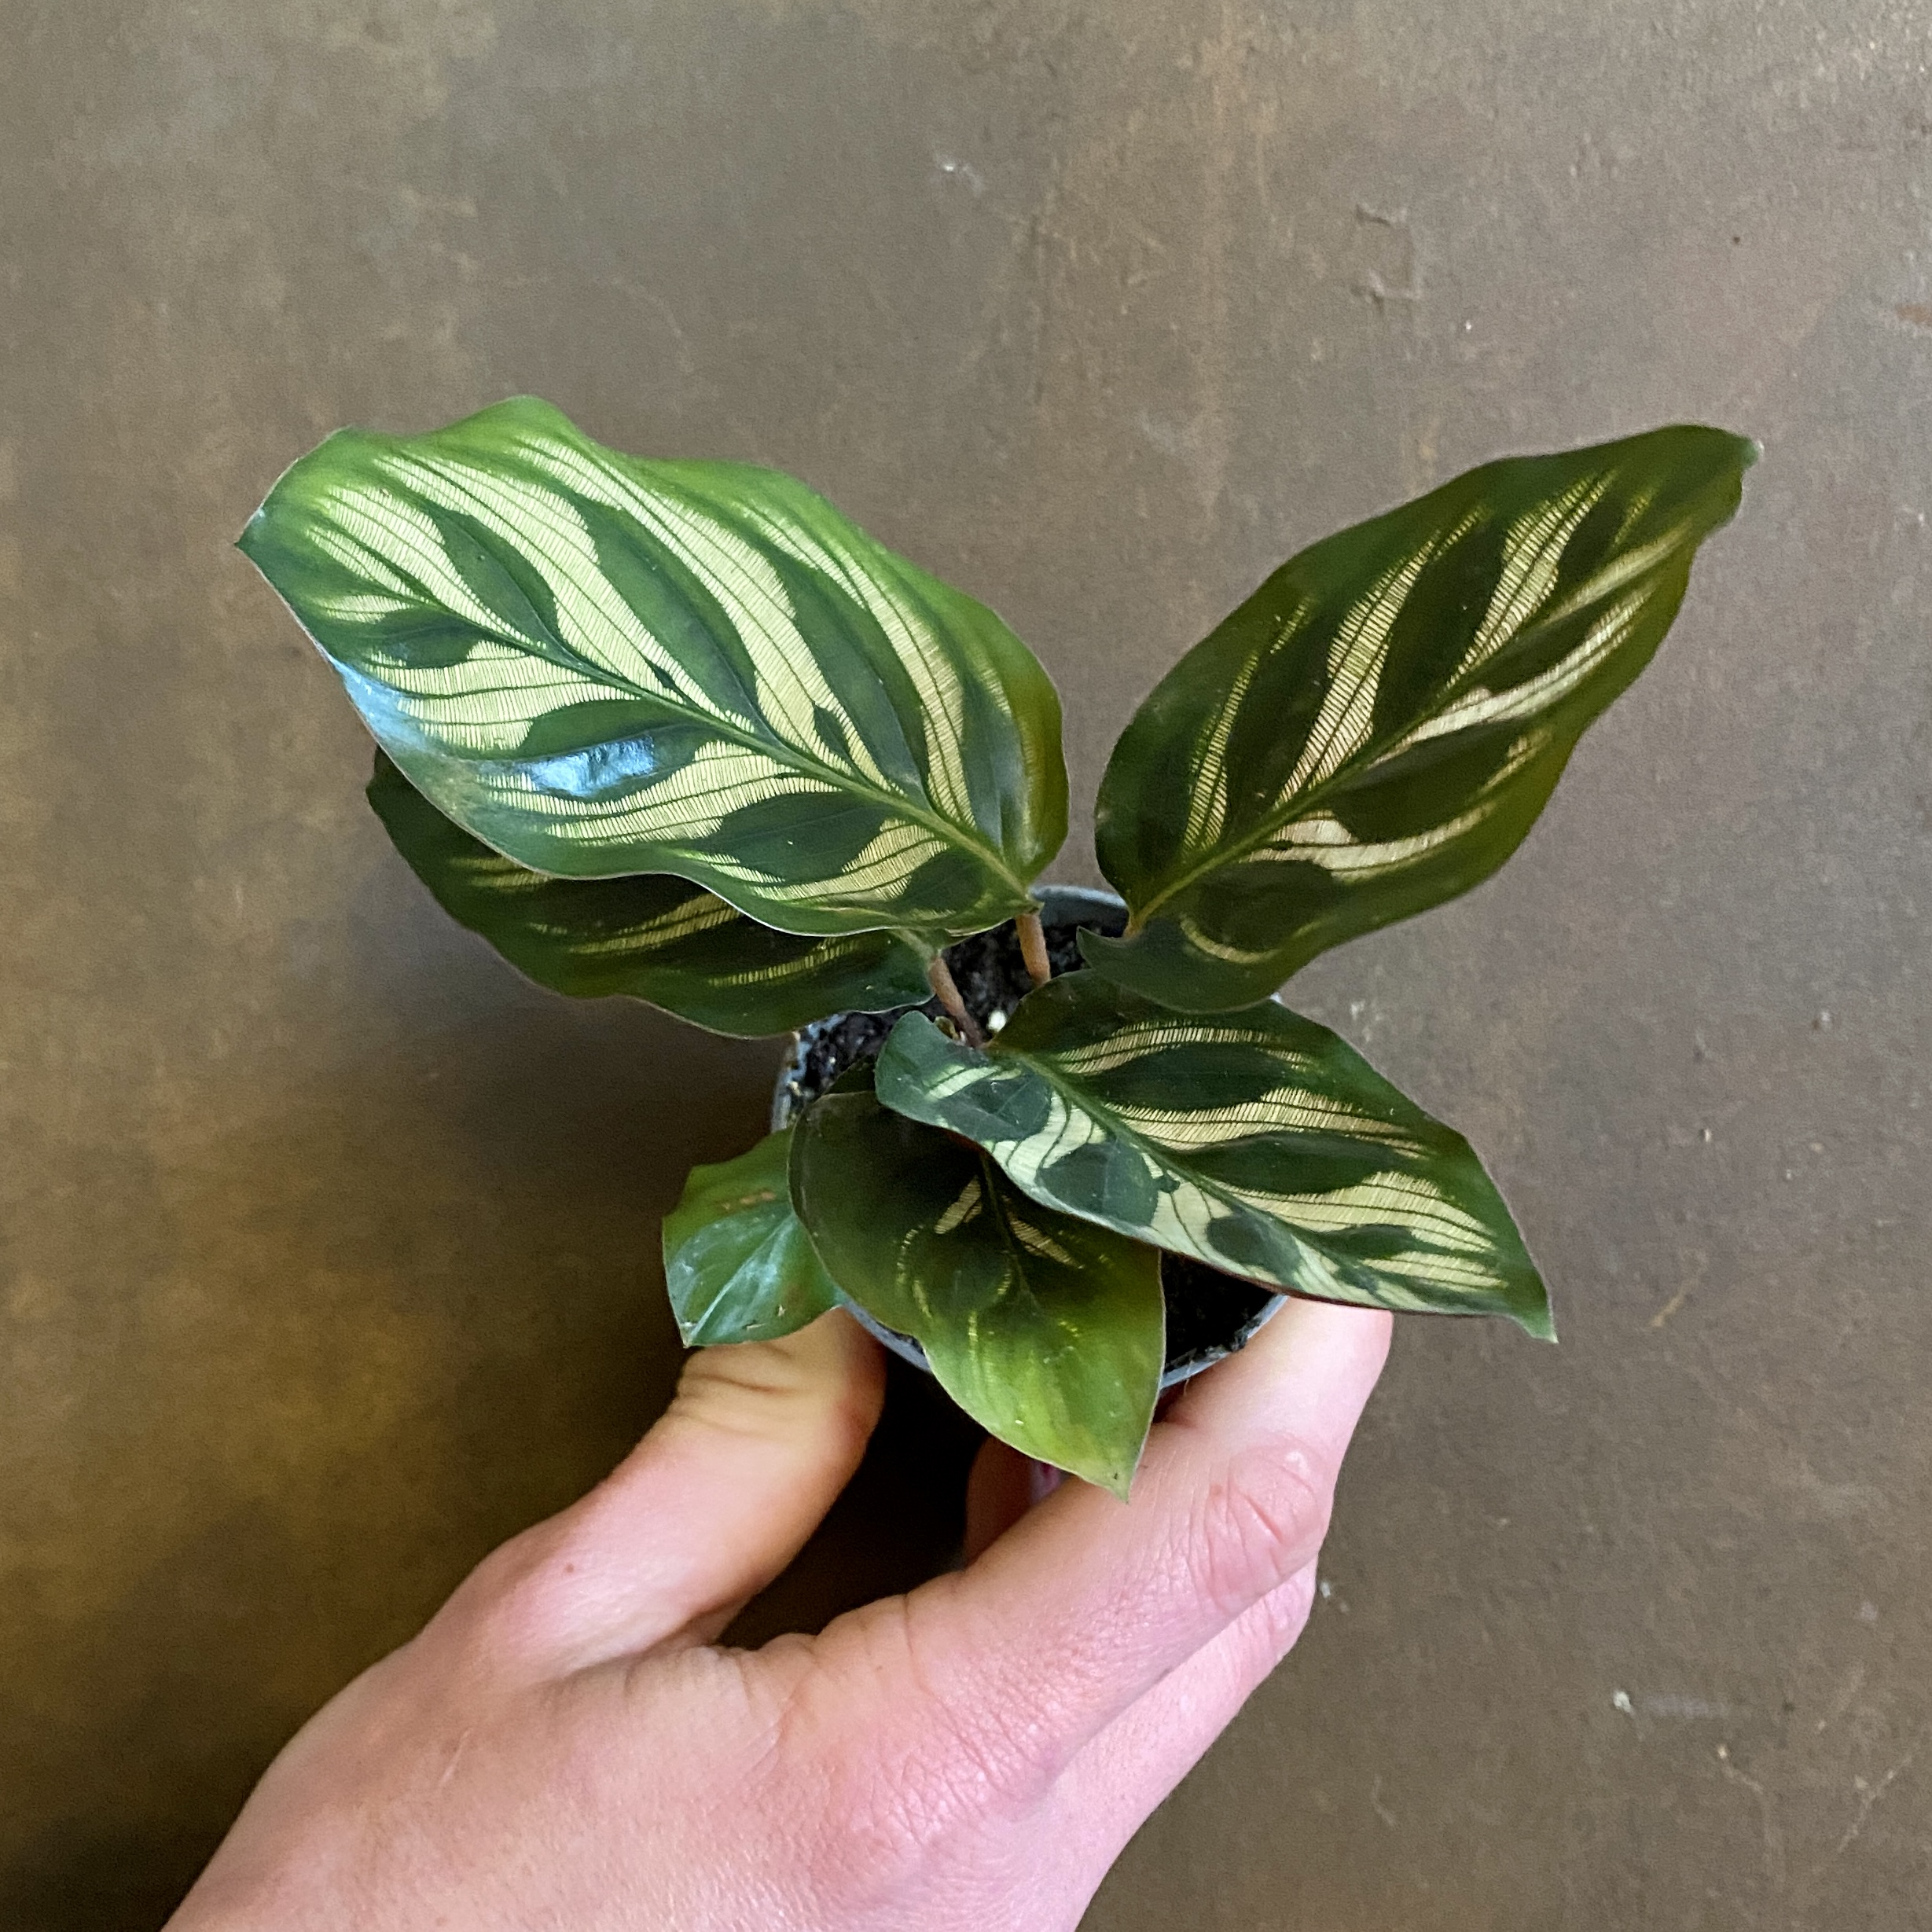 Calathea makoyana (6cm pot)